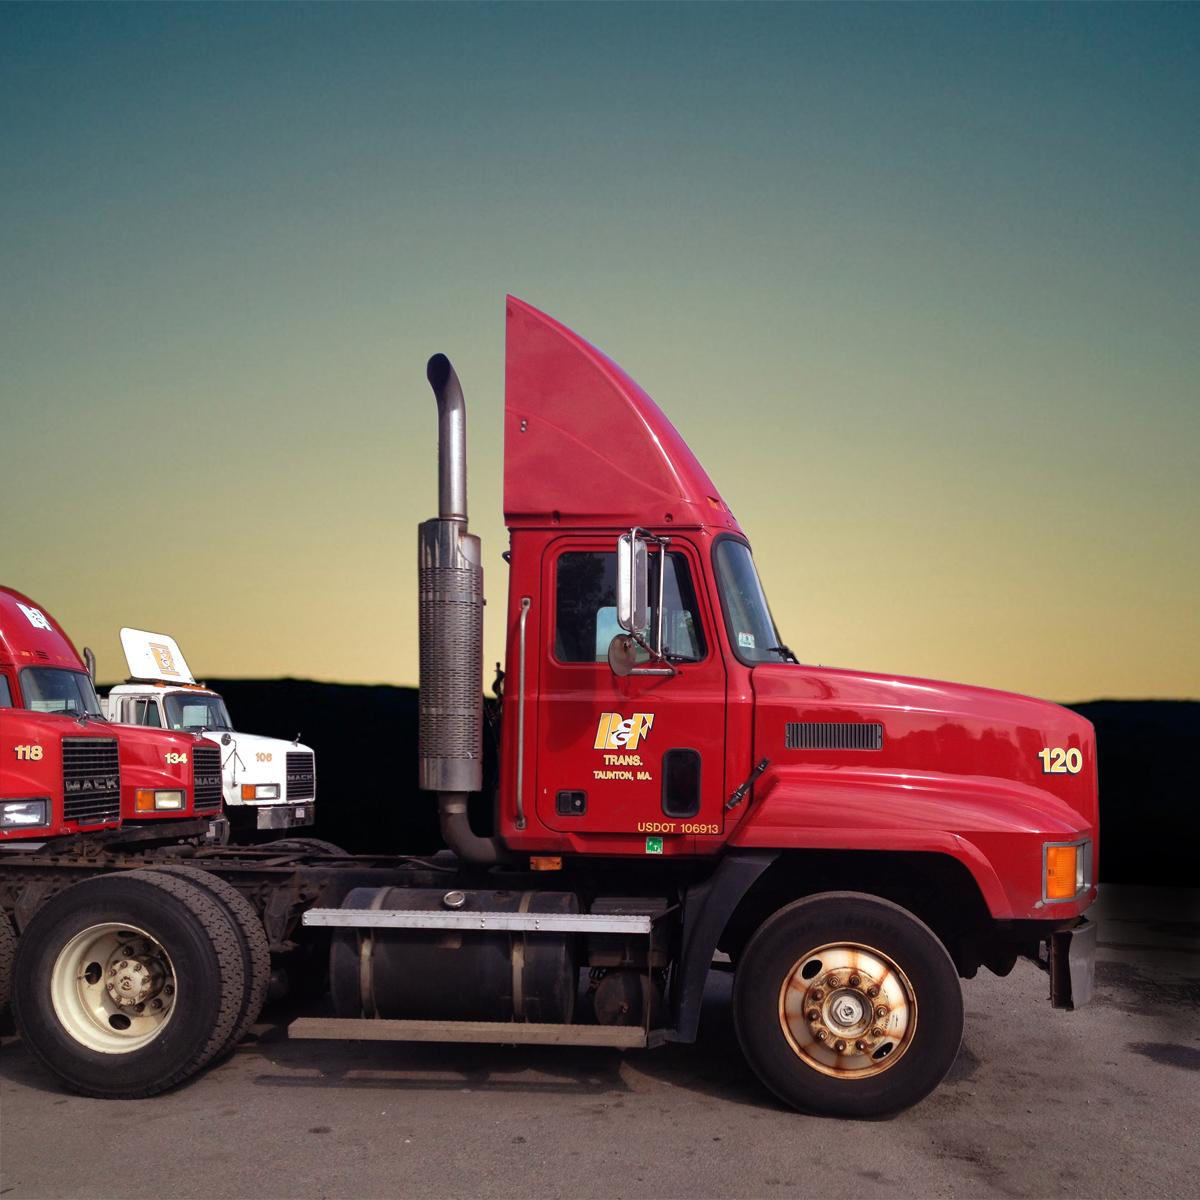 test truck copy